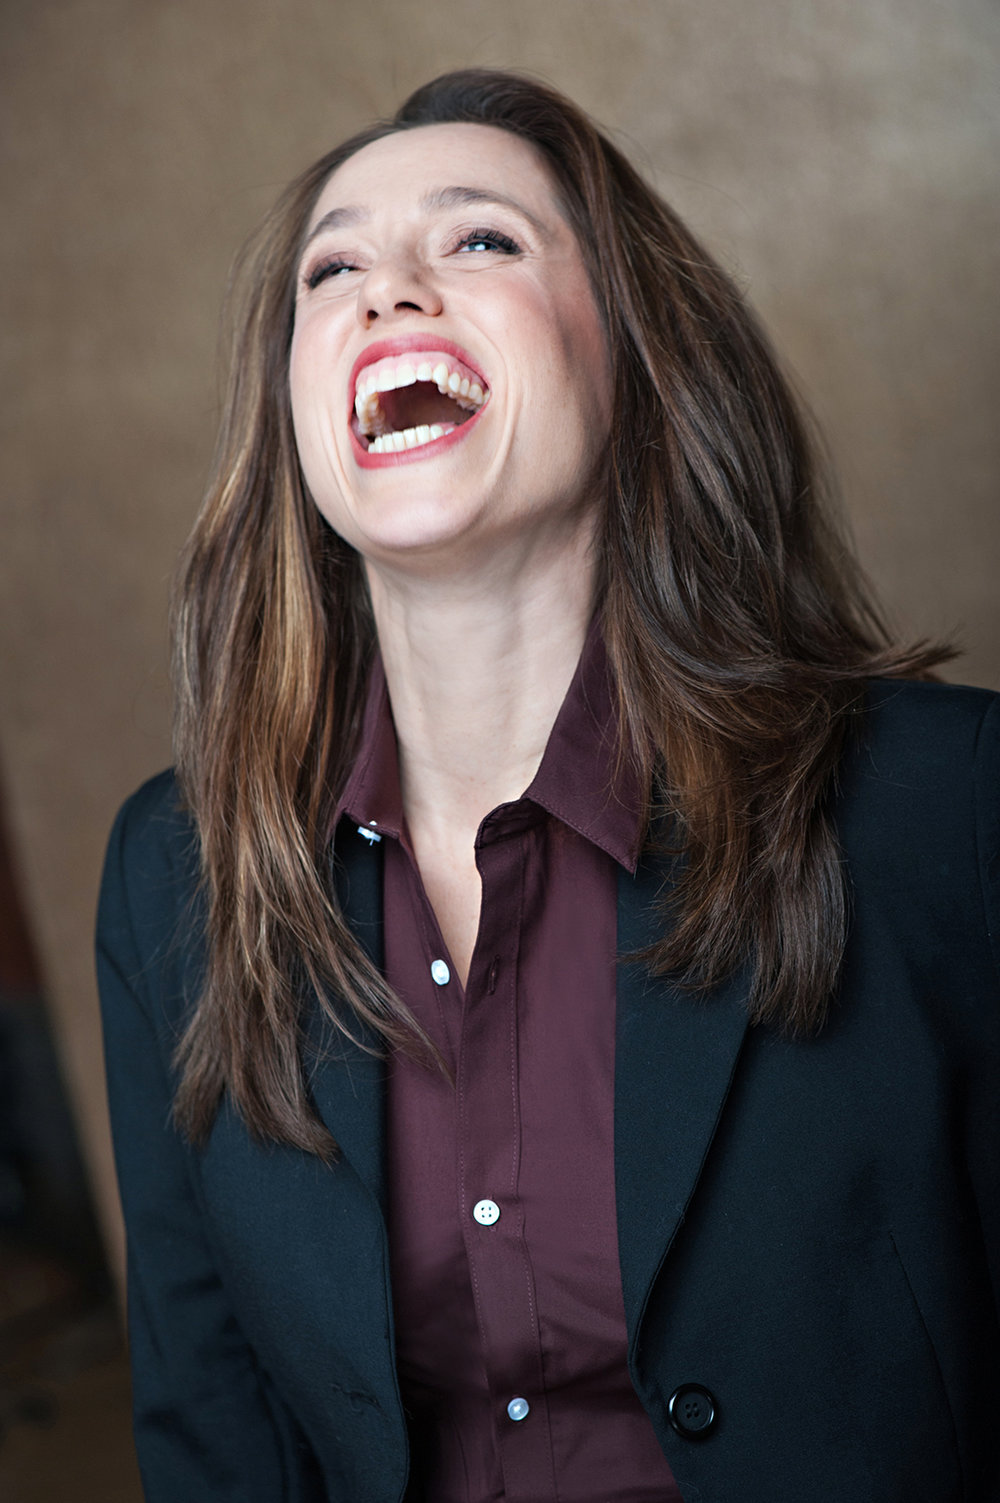 Actress Athena Reich